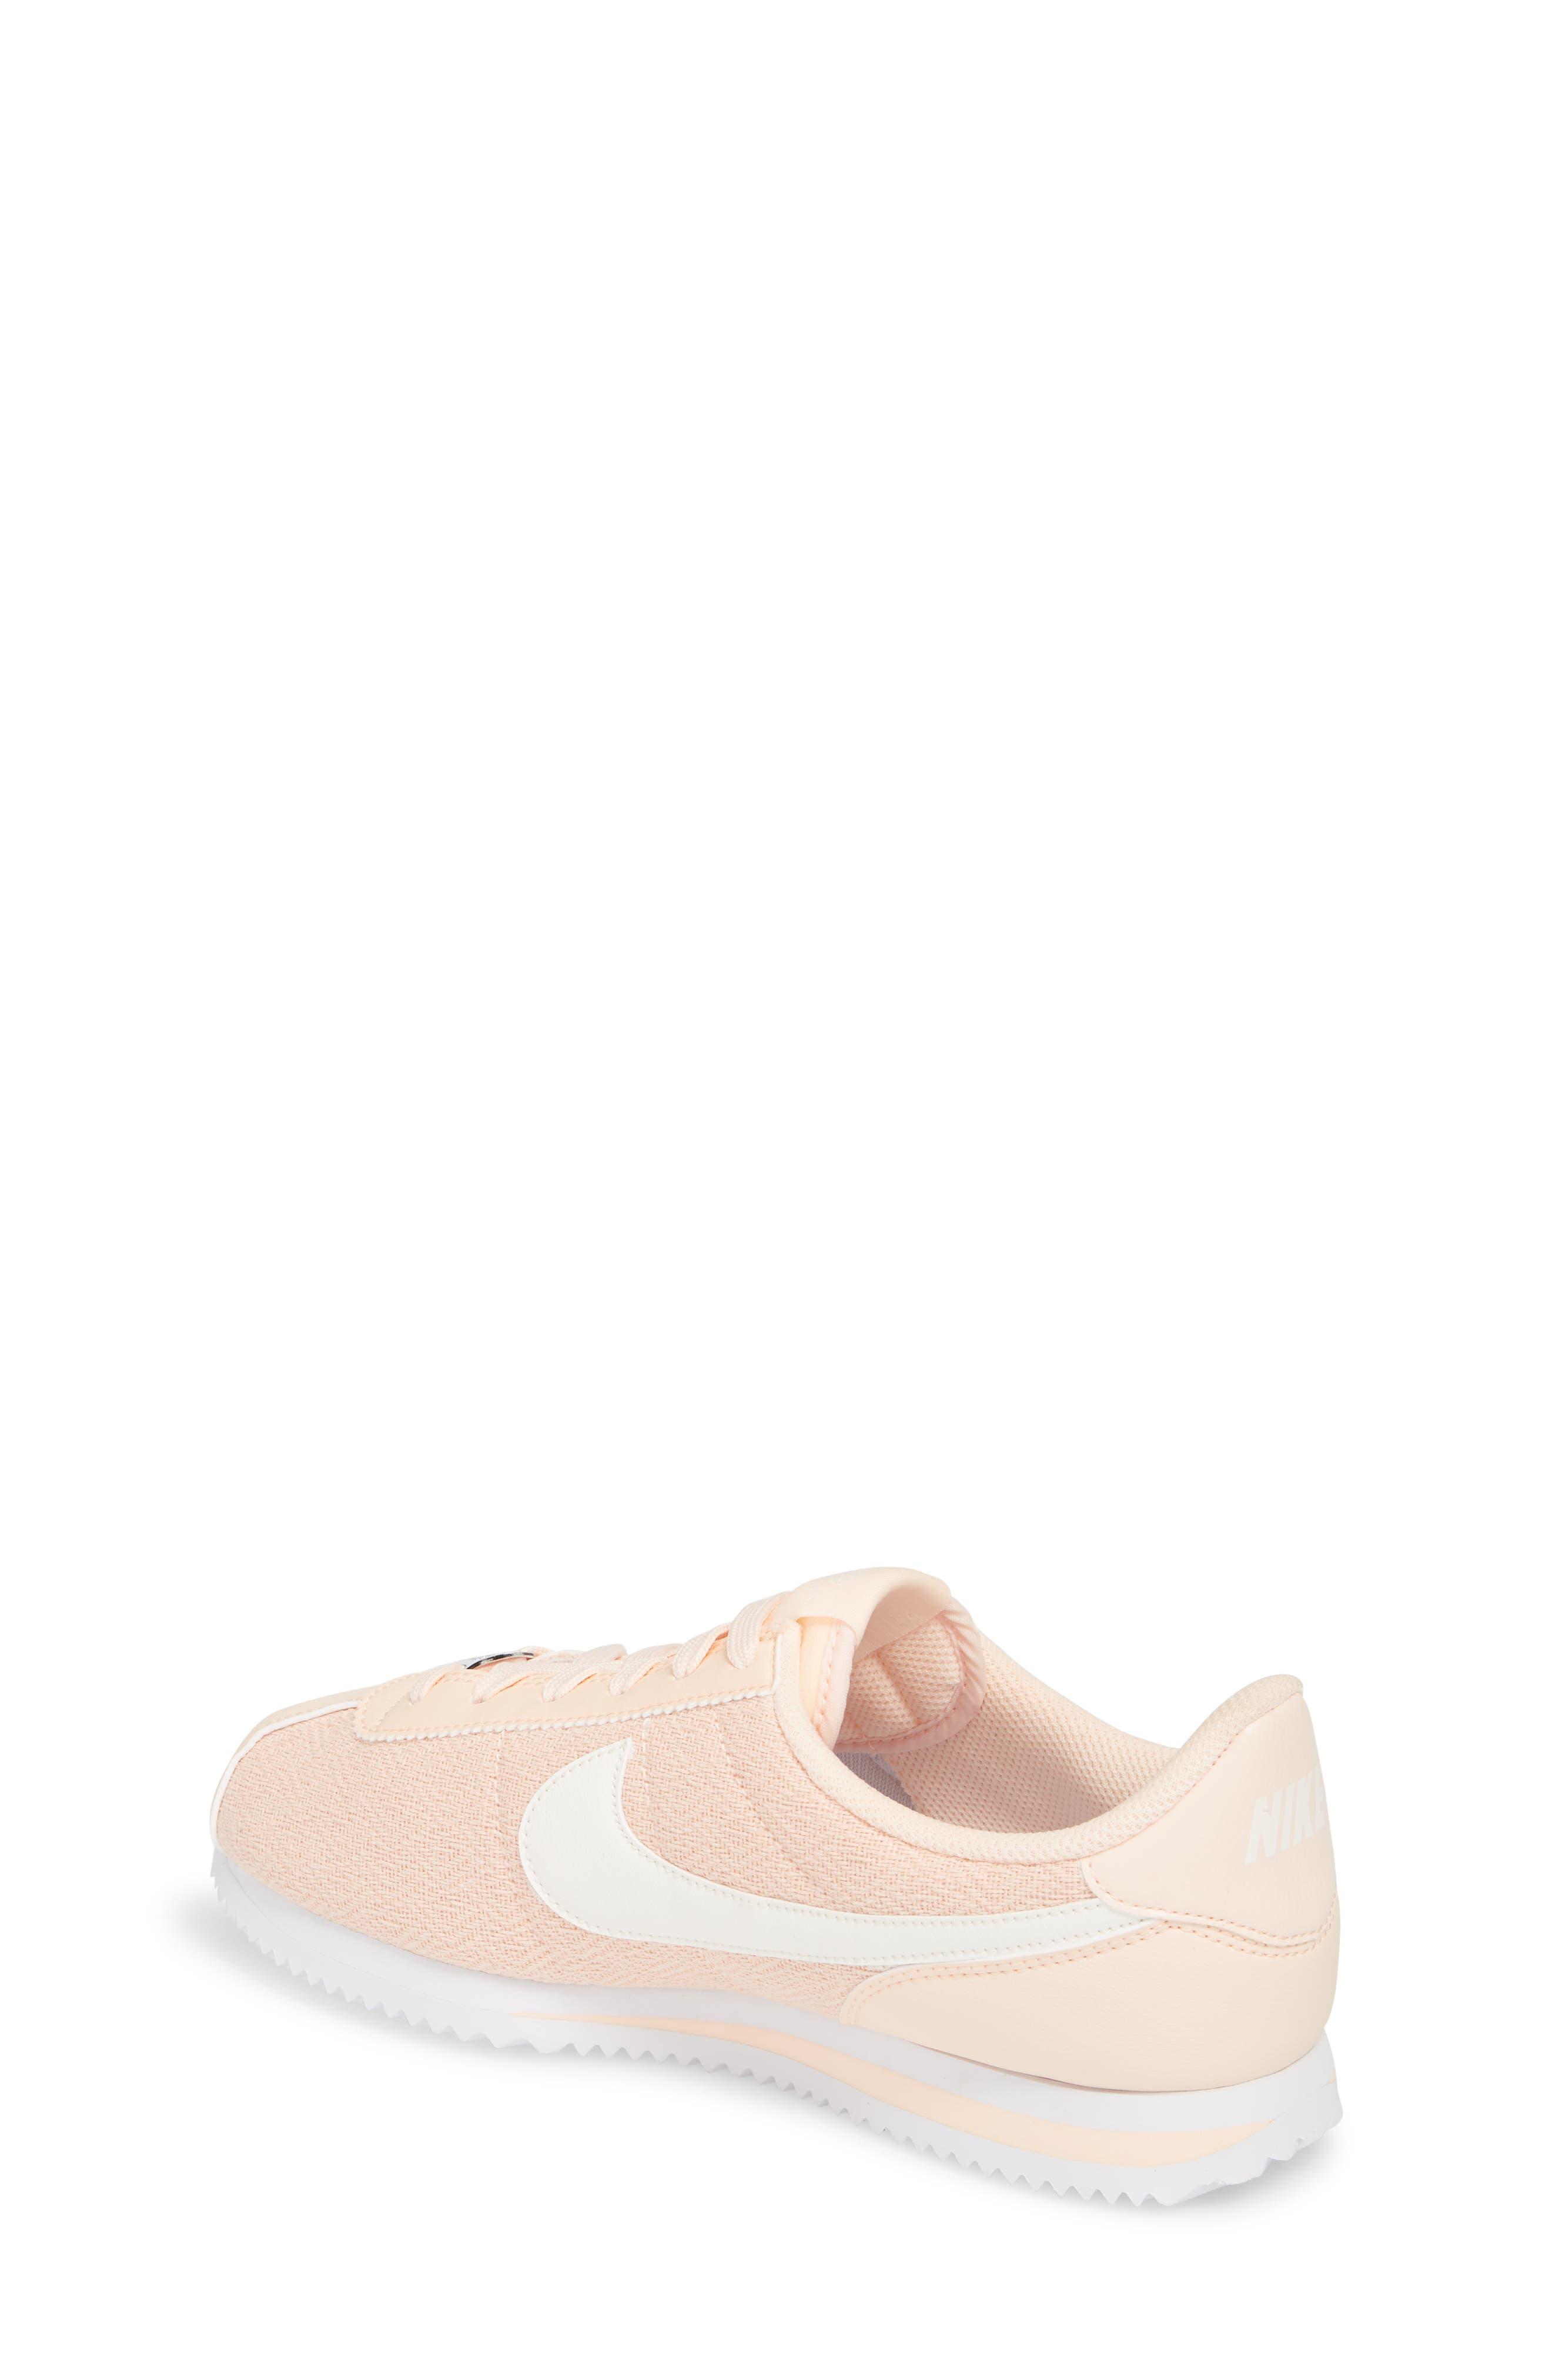 Cortez Basic TXT SE Sneaker,                             Alternate thumbnail 2, color,                             Crimson Tint/ Sail/ White